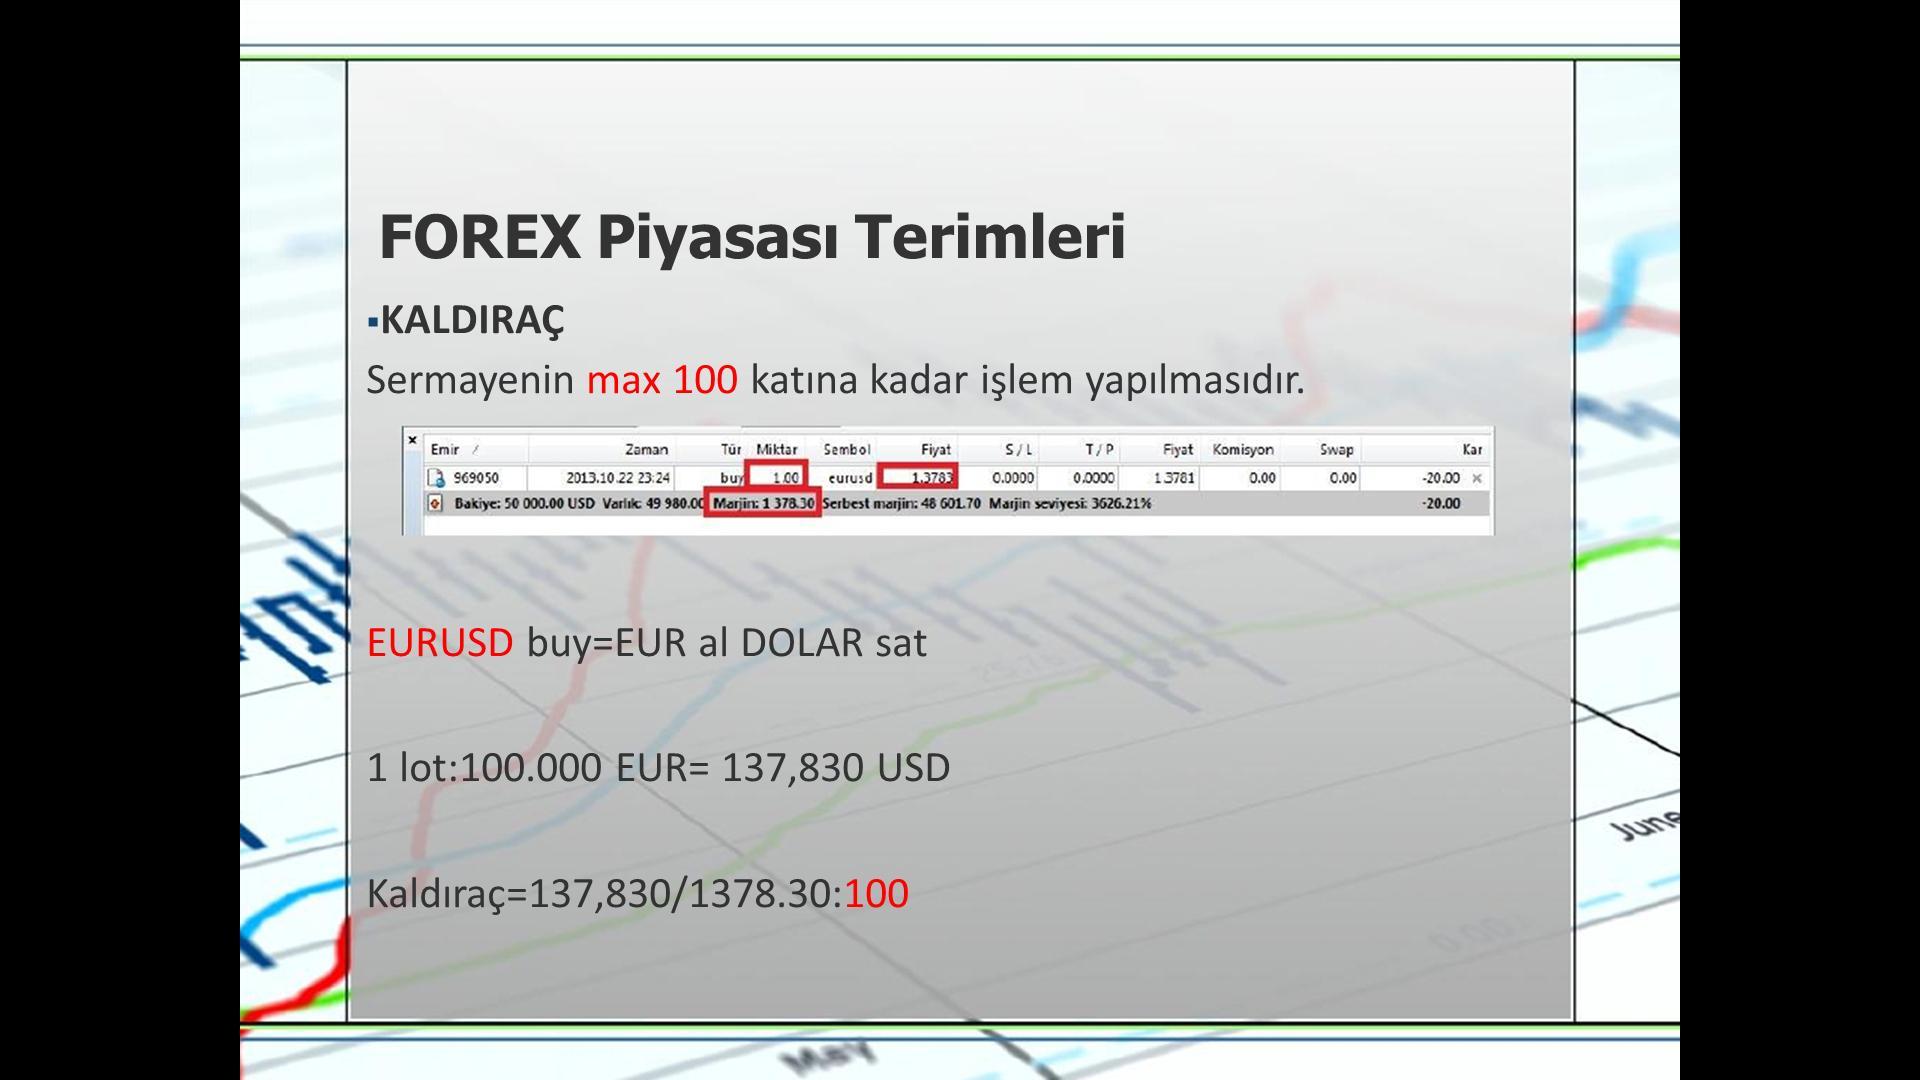 Forex 1 lot nedir